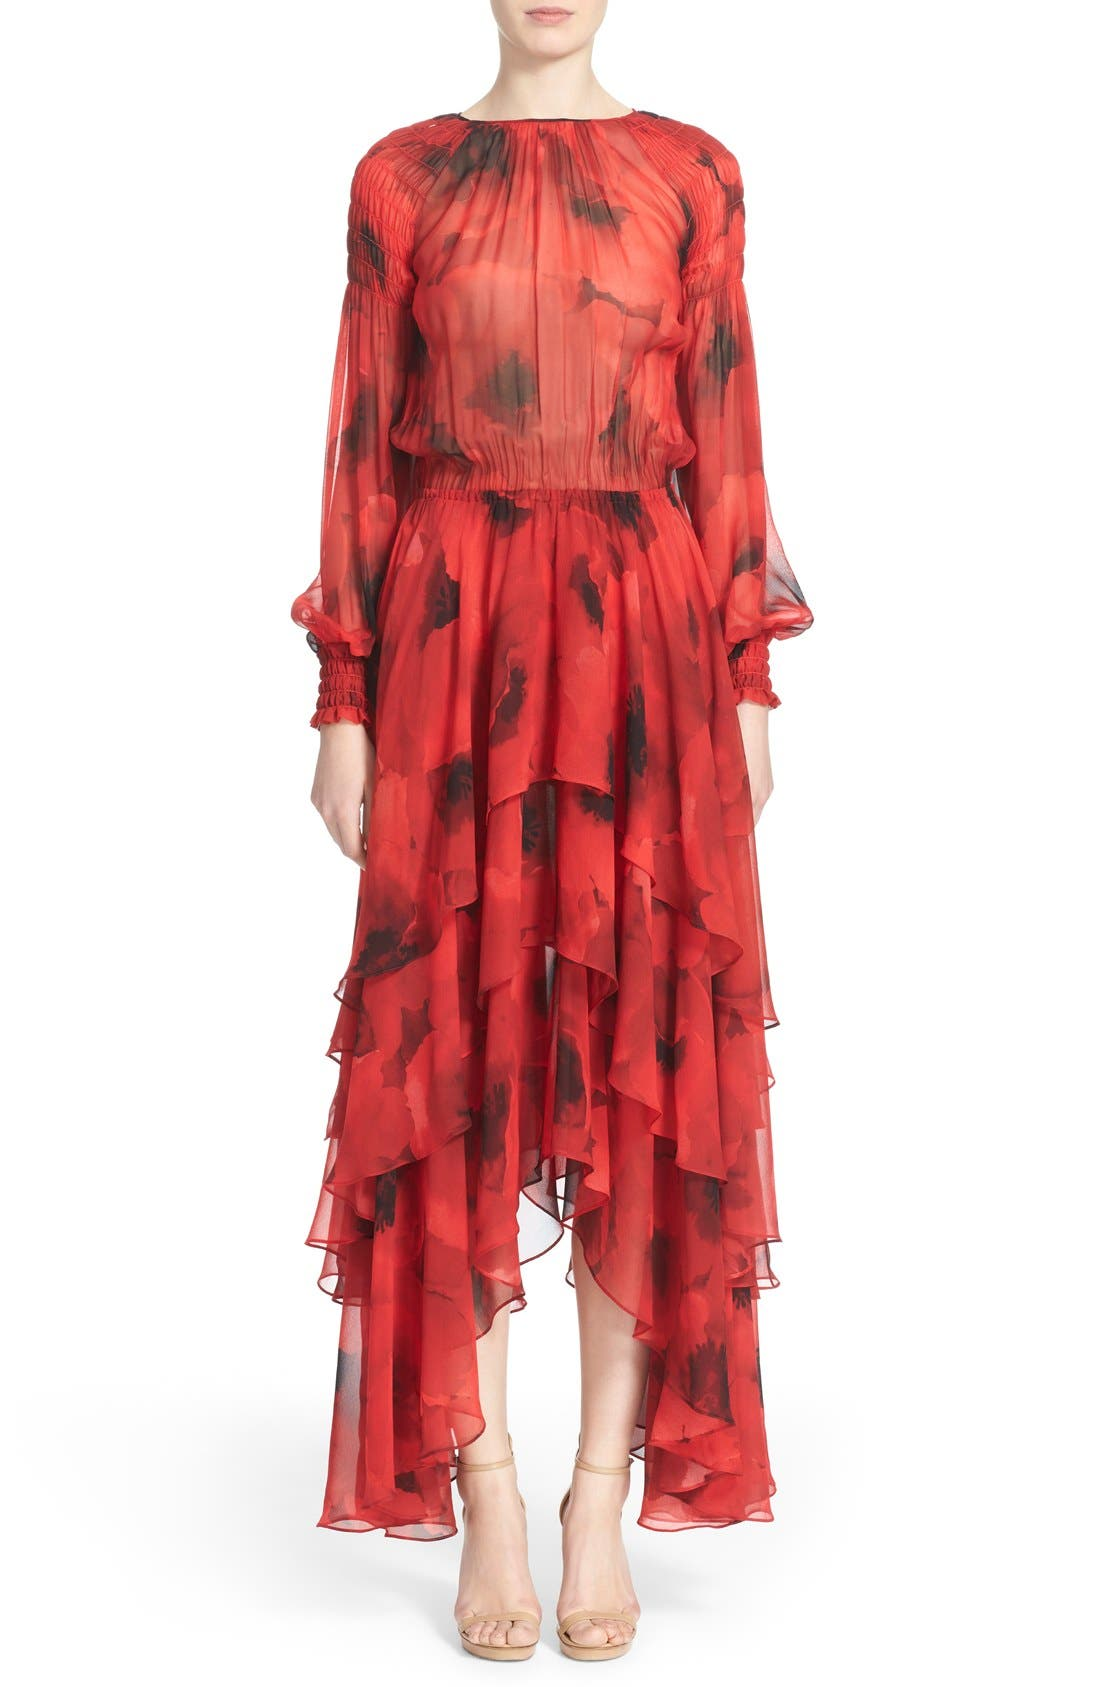 Main Image - Michael Kors Poppy Print Tiered Silk Peasant Dress